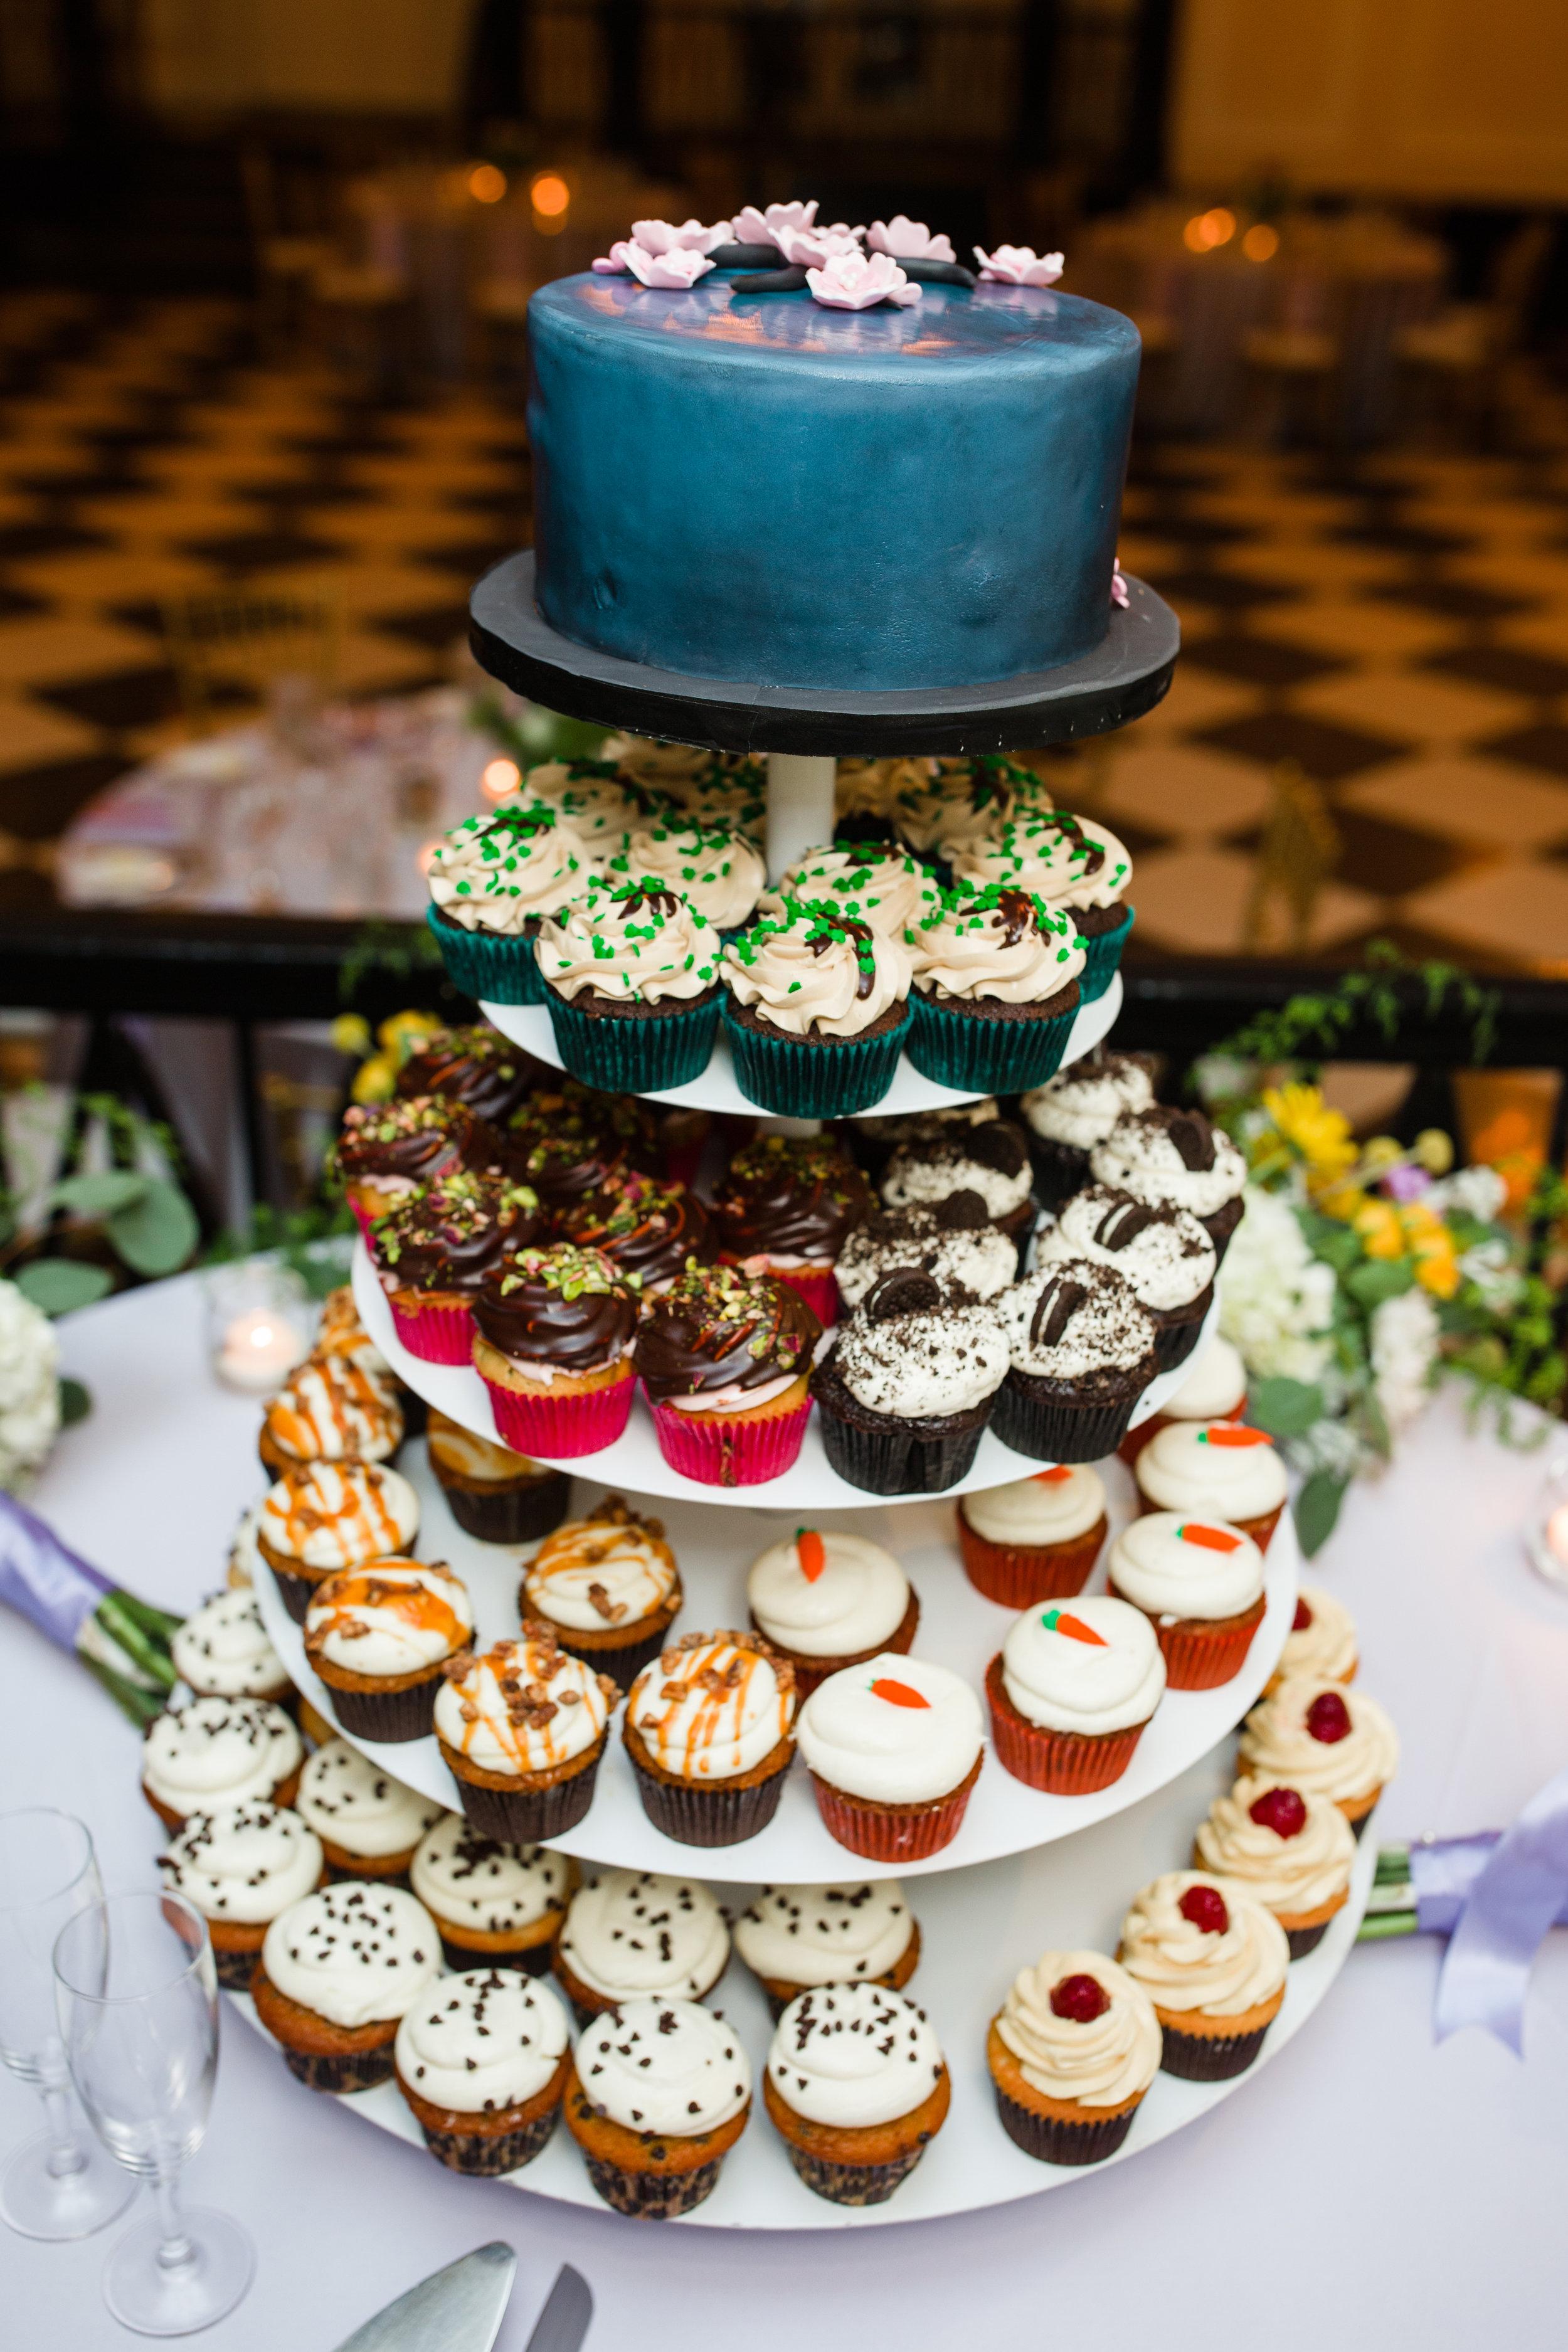 2017_04_30_jenny_jonathans_wedding_reception-145.jpg